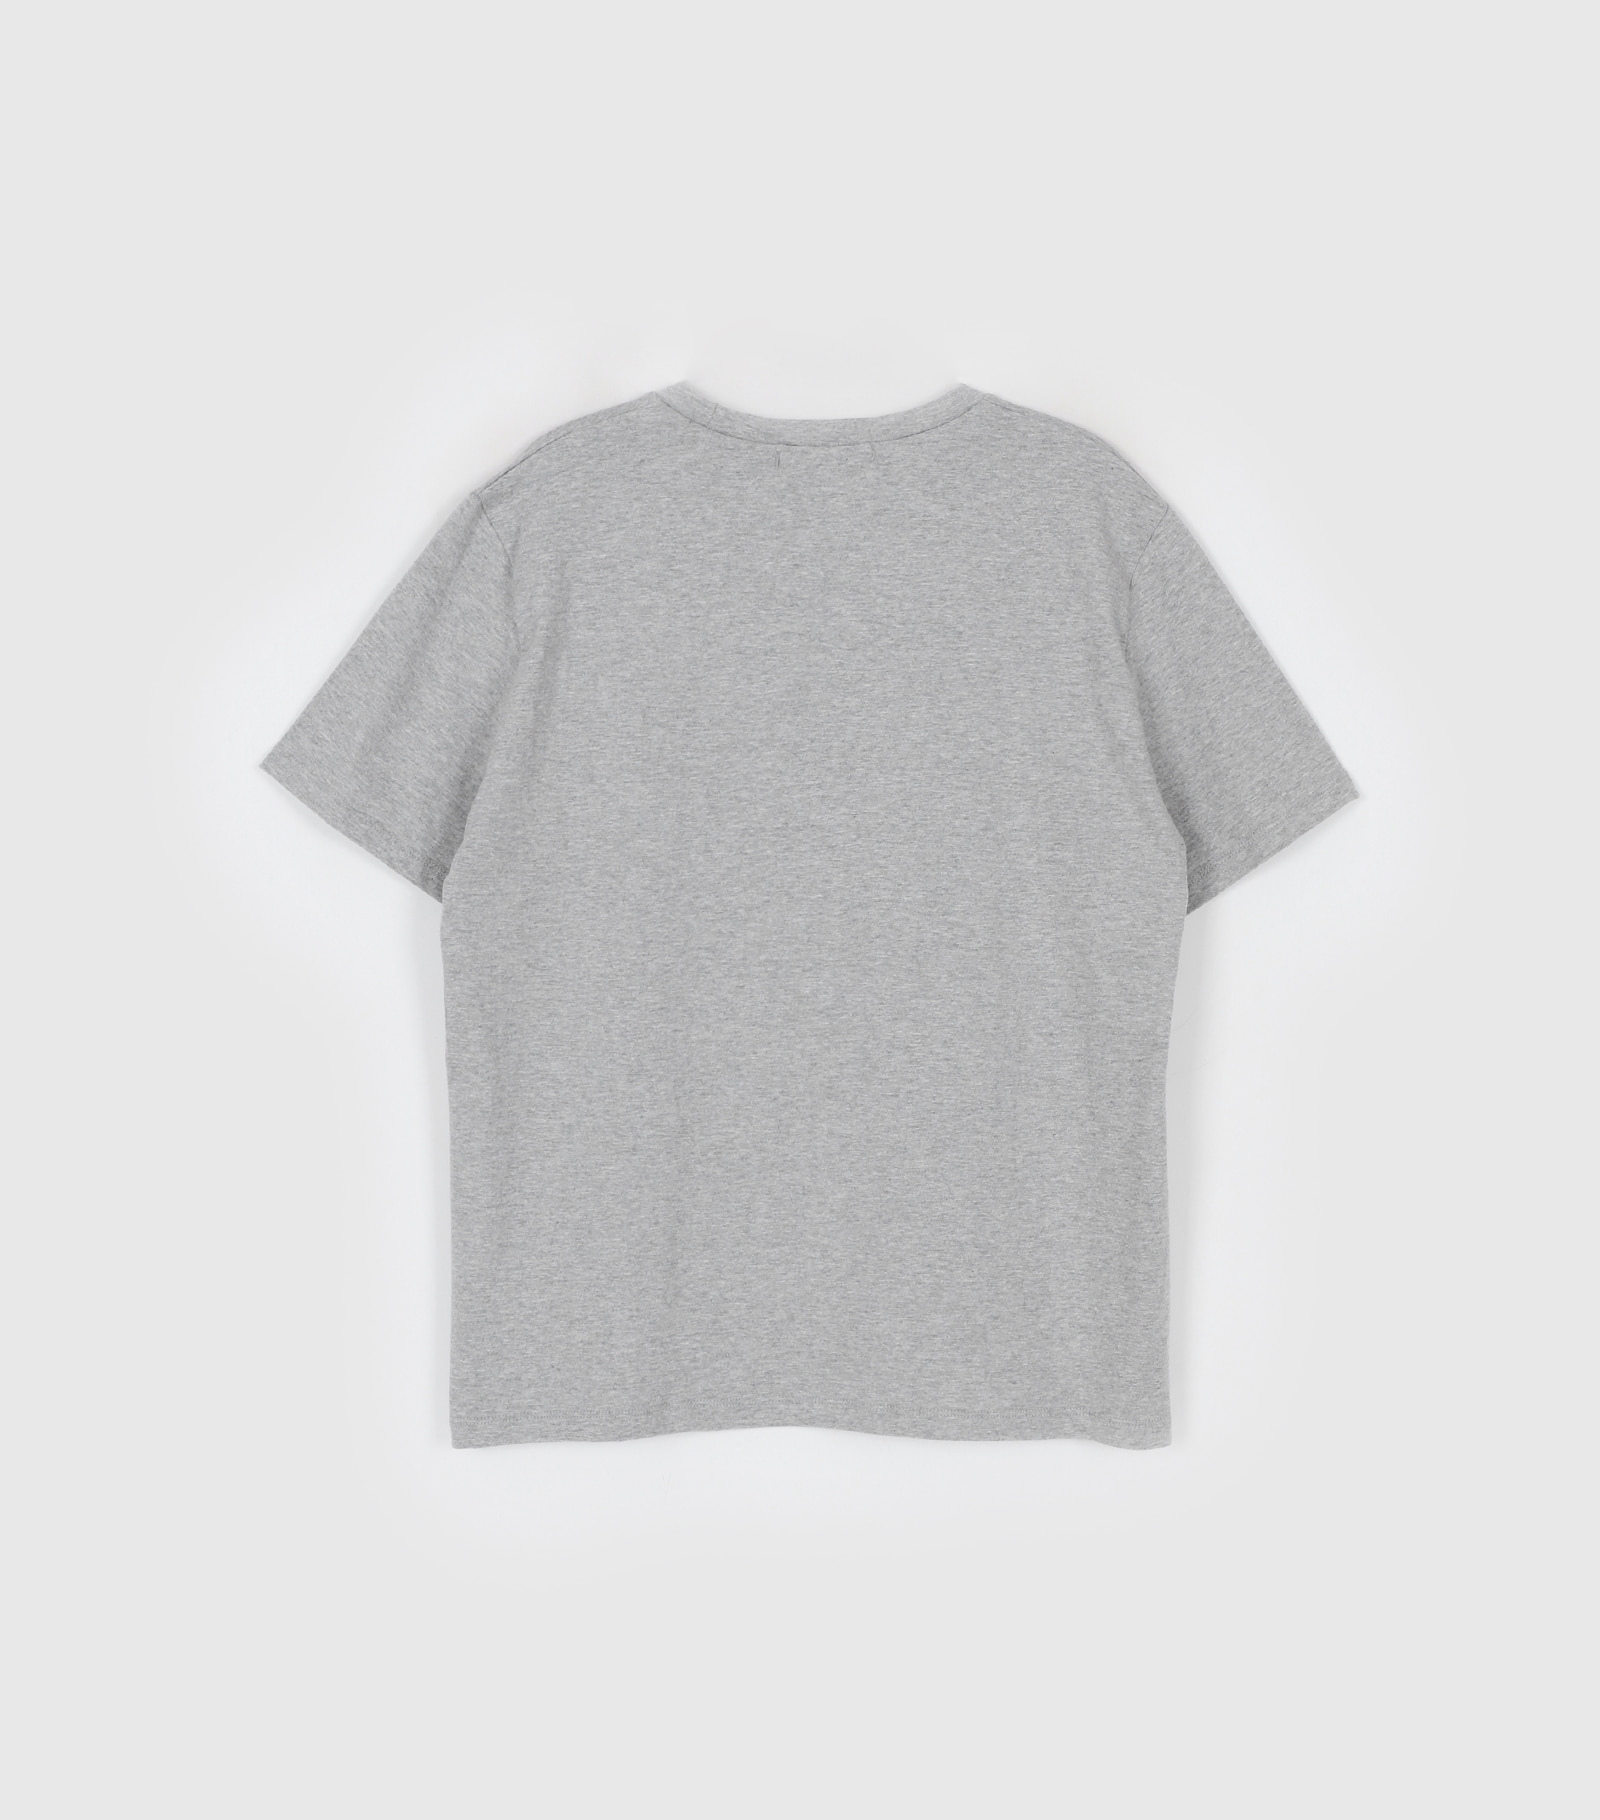 Rye printing half t-shirt